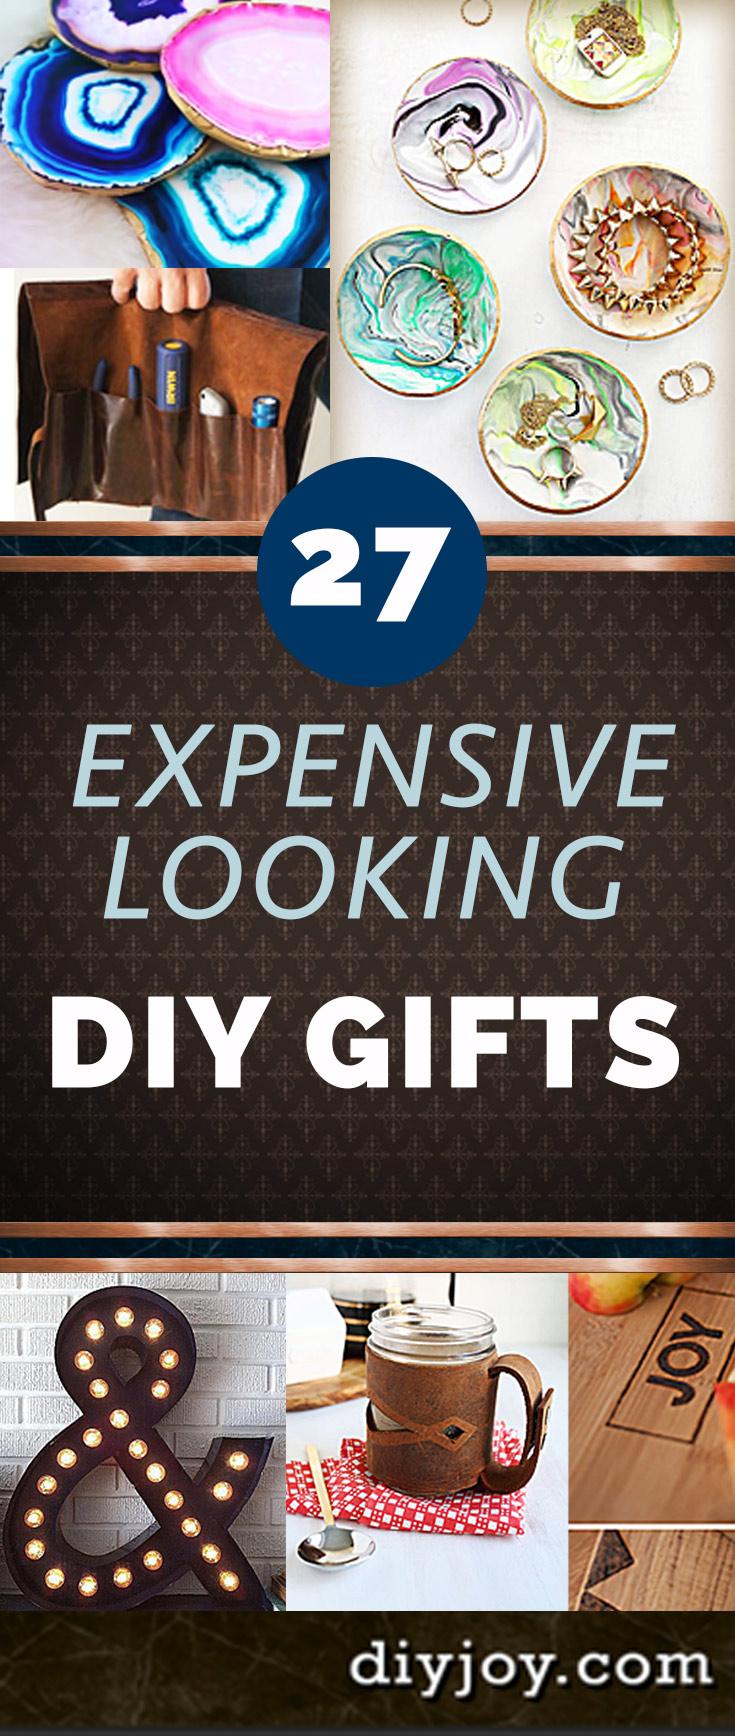 Cheap DIY Gifts Pinterest - Cool DYI Christmas Gifts